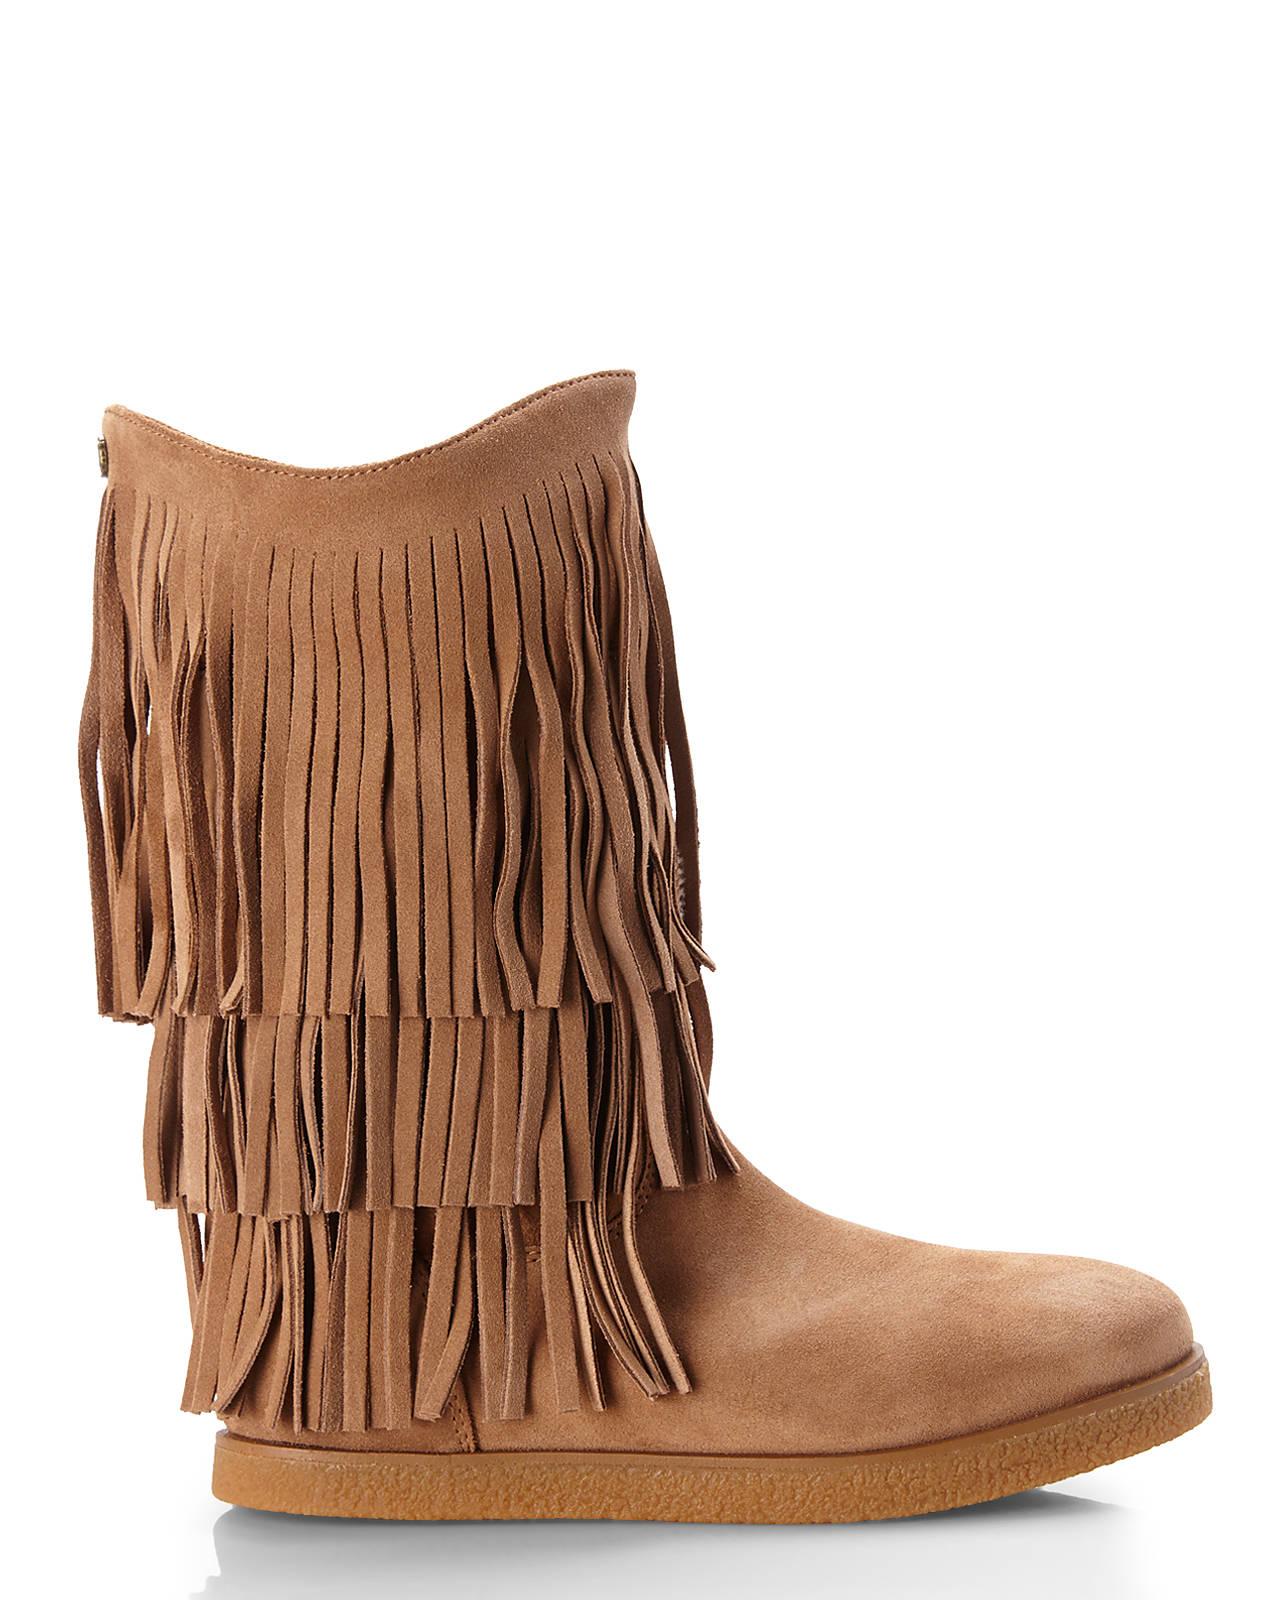 Koolaburra Real Fur Lined Josie Fringe Boots in Brown   Lyst